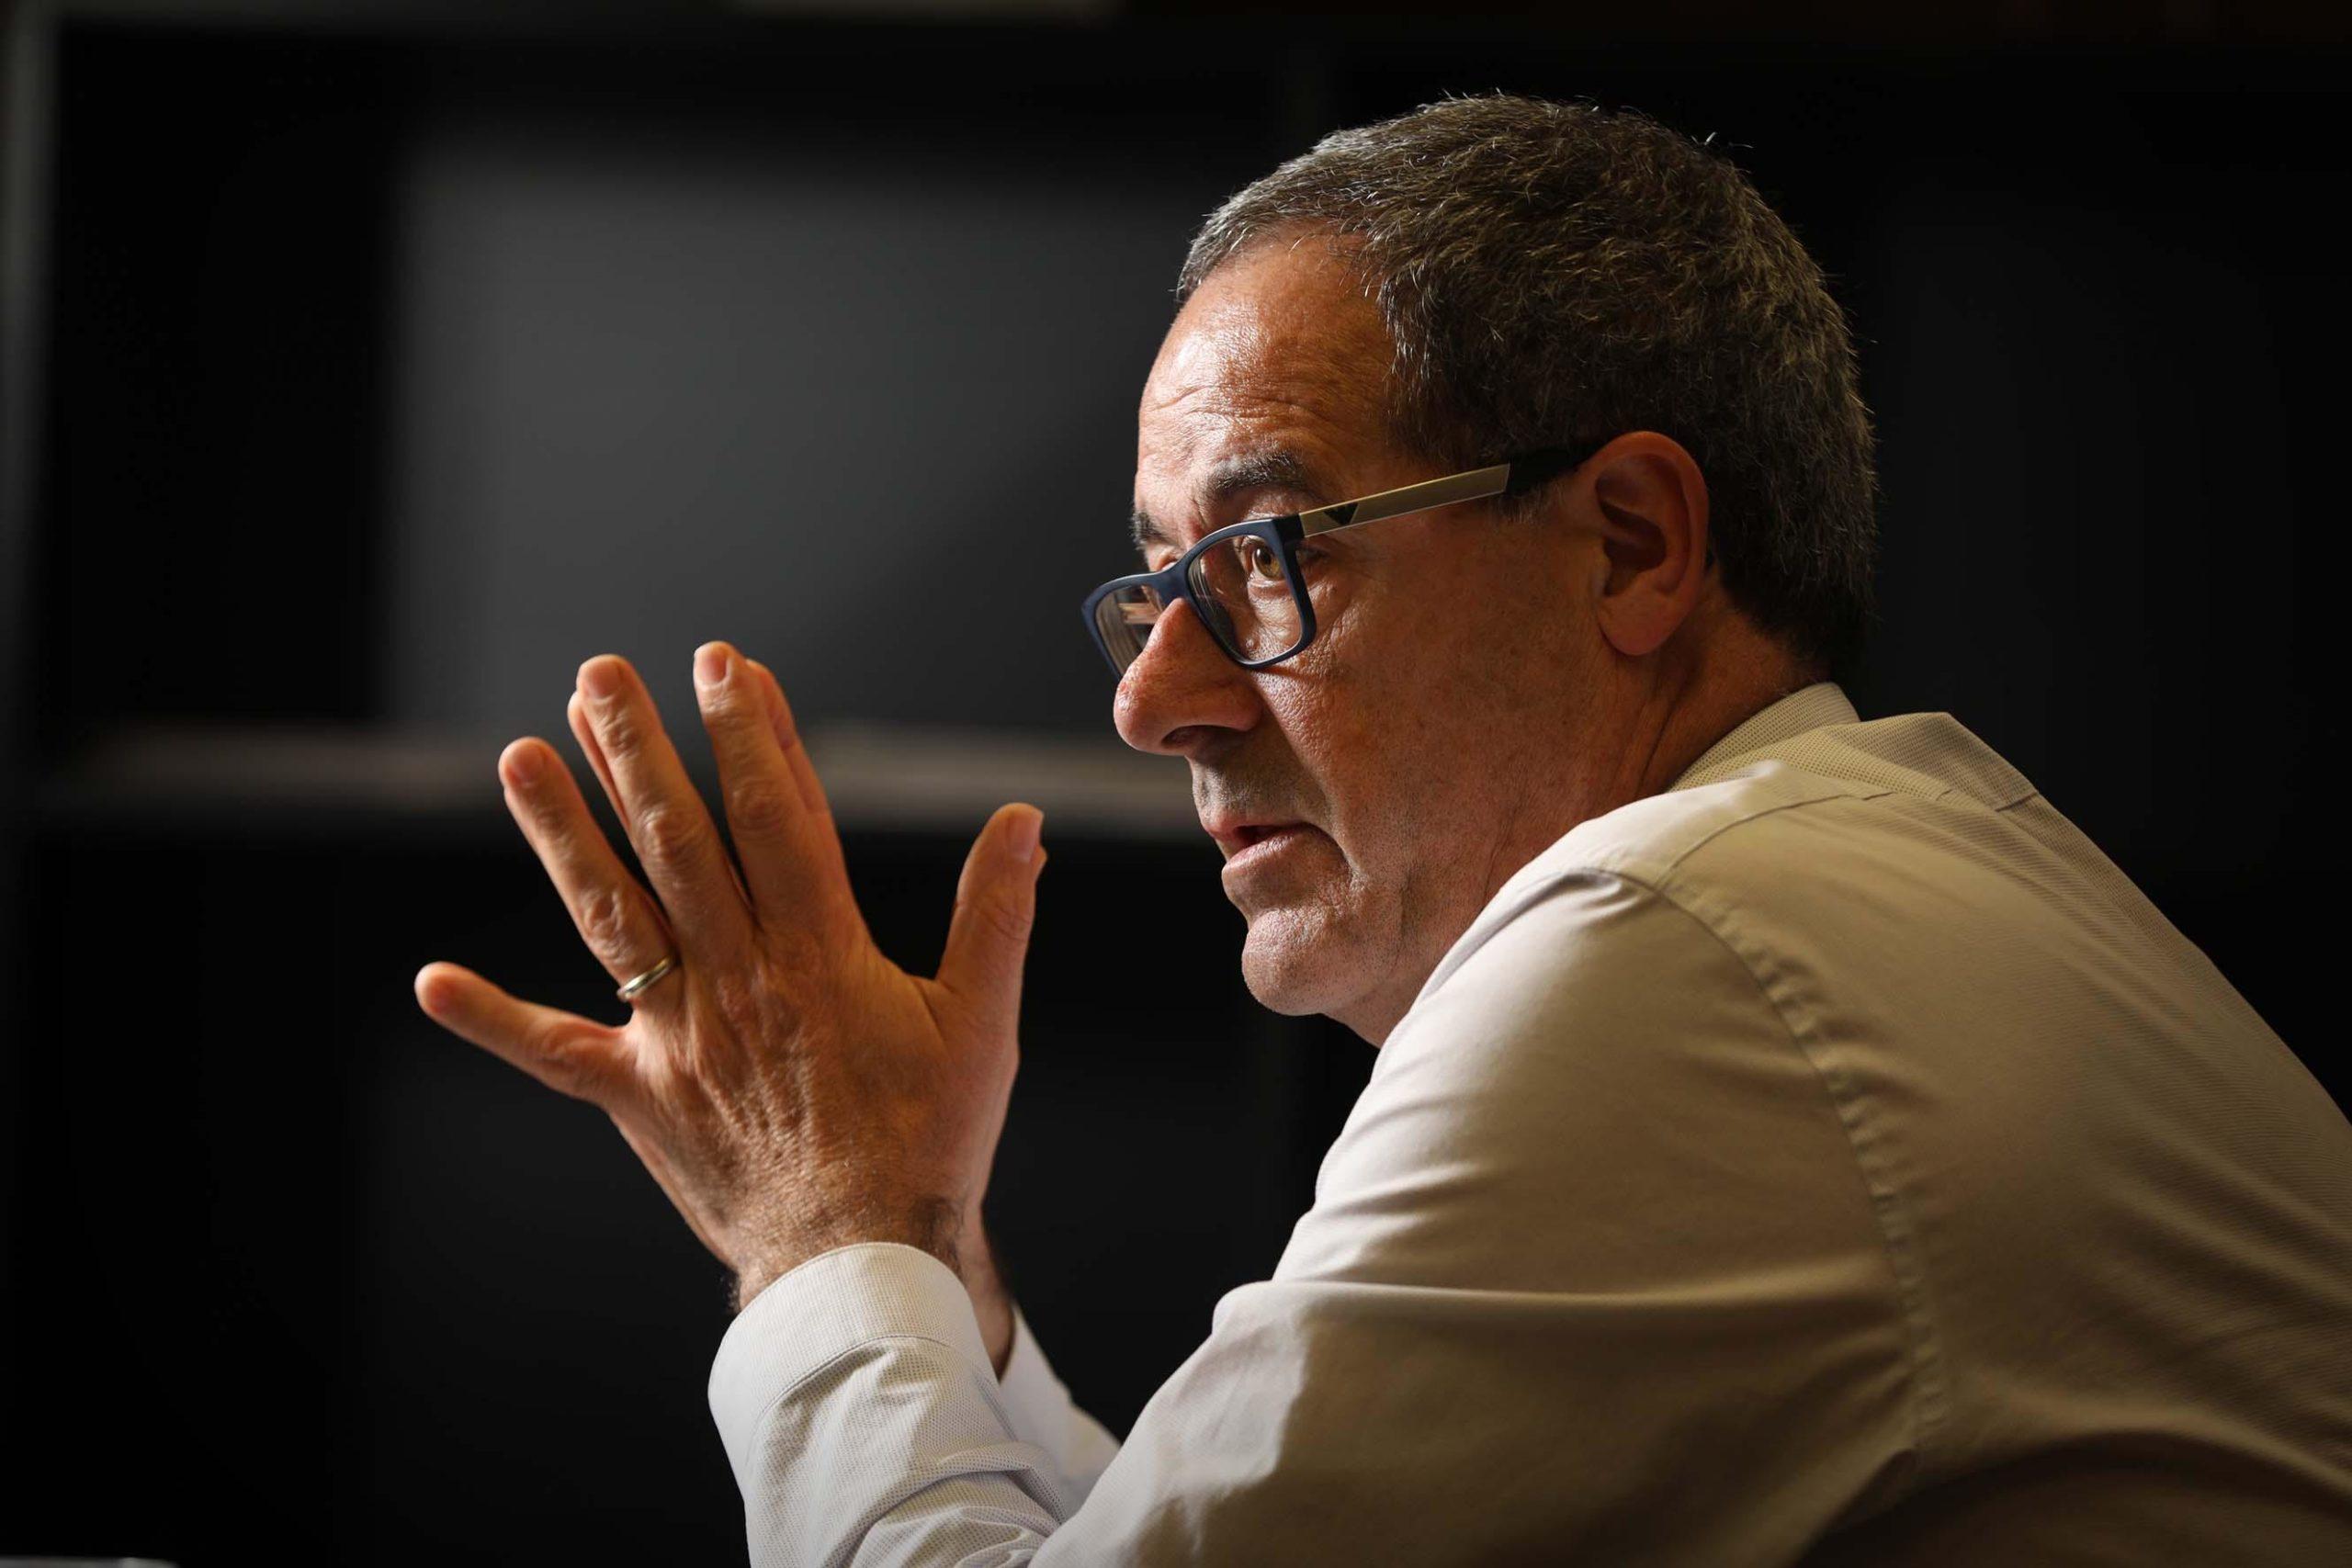 Pere Macias, en la primera entrevista com a coordinador del nou Pla de Rodalies / Jordi Play